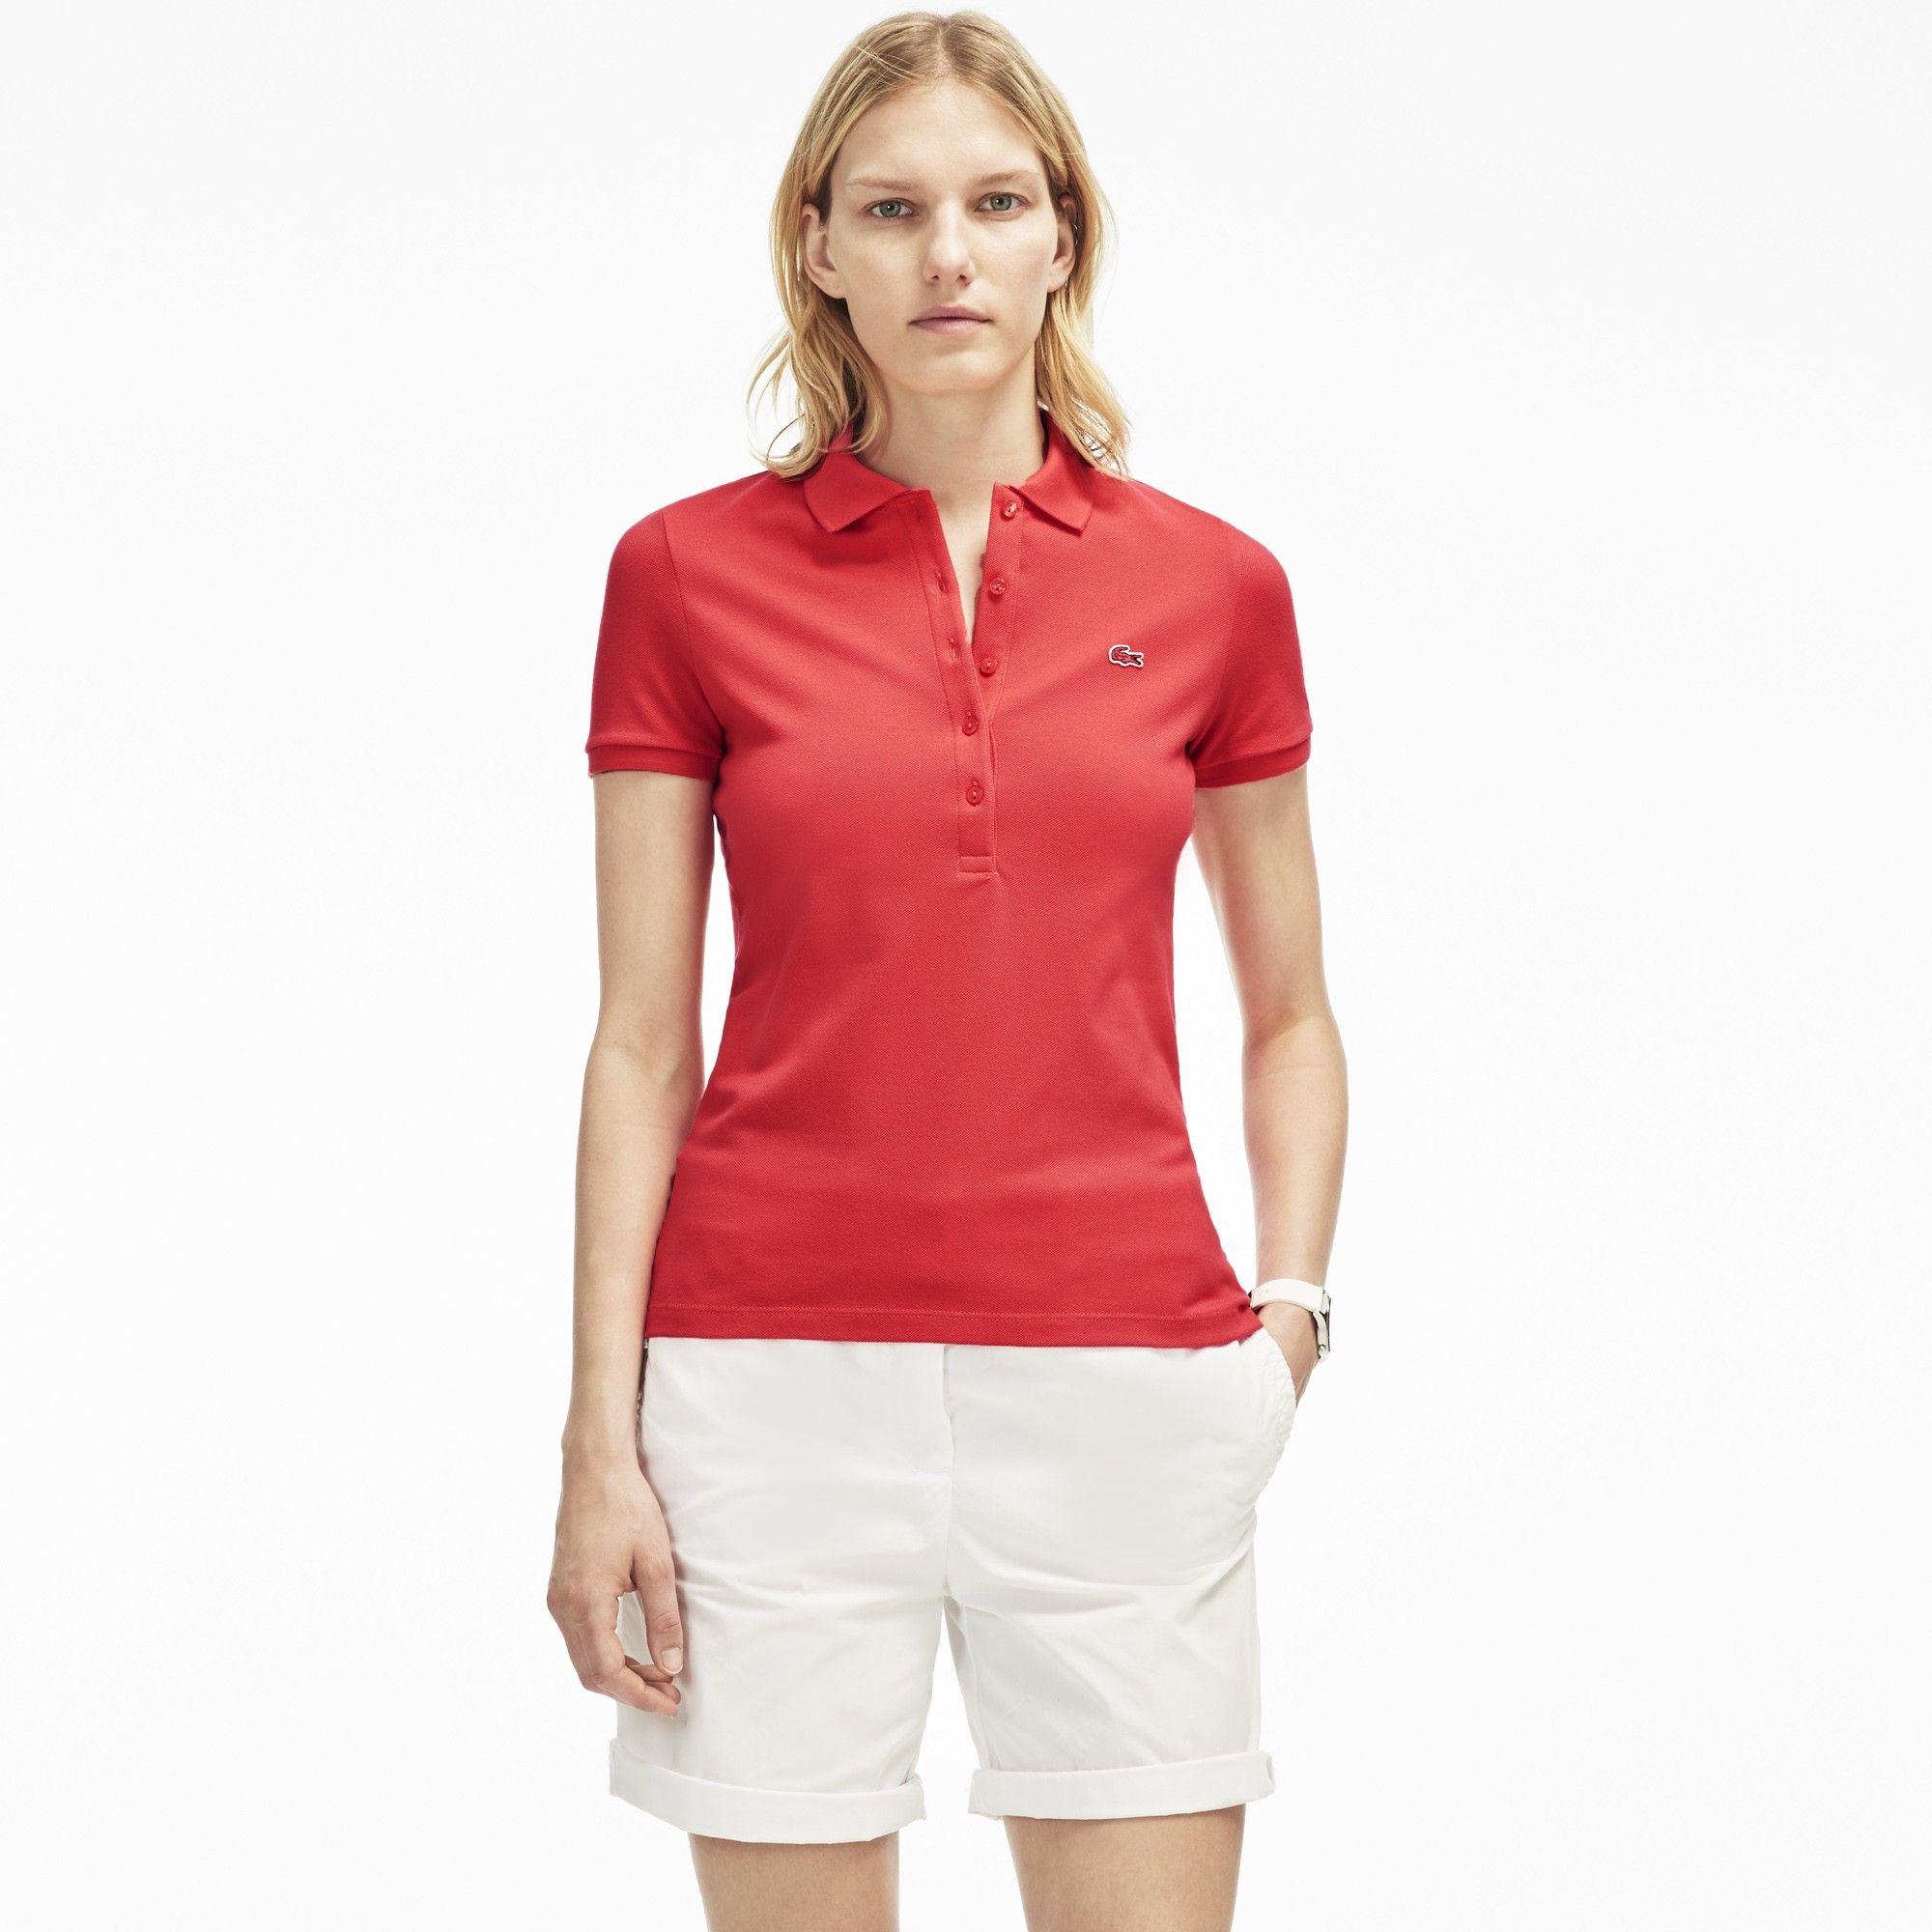 3394a3da Lacoste Womens Polo Shirts - DREAMWORKS